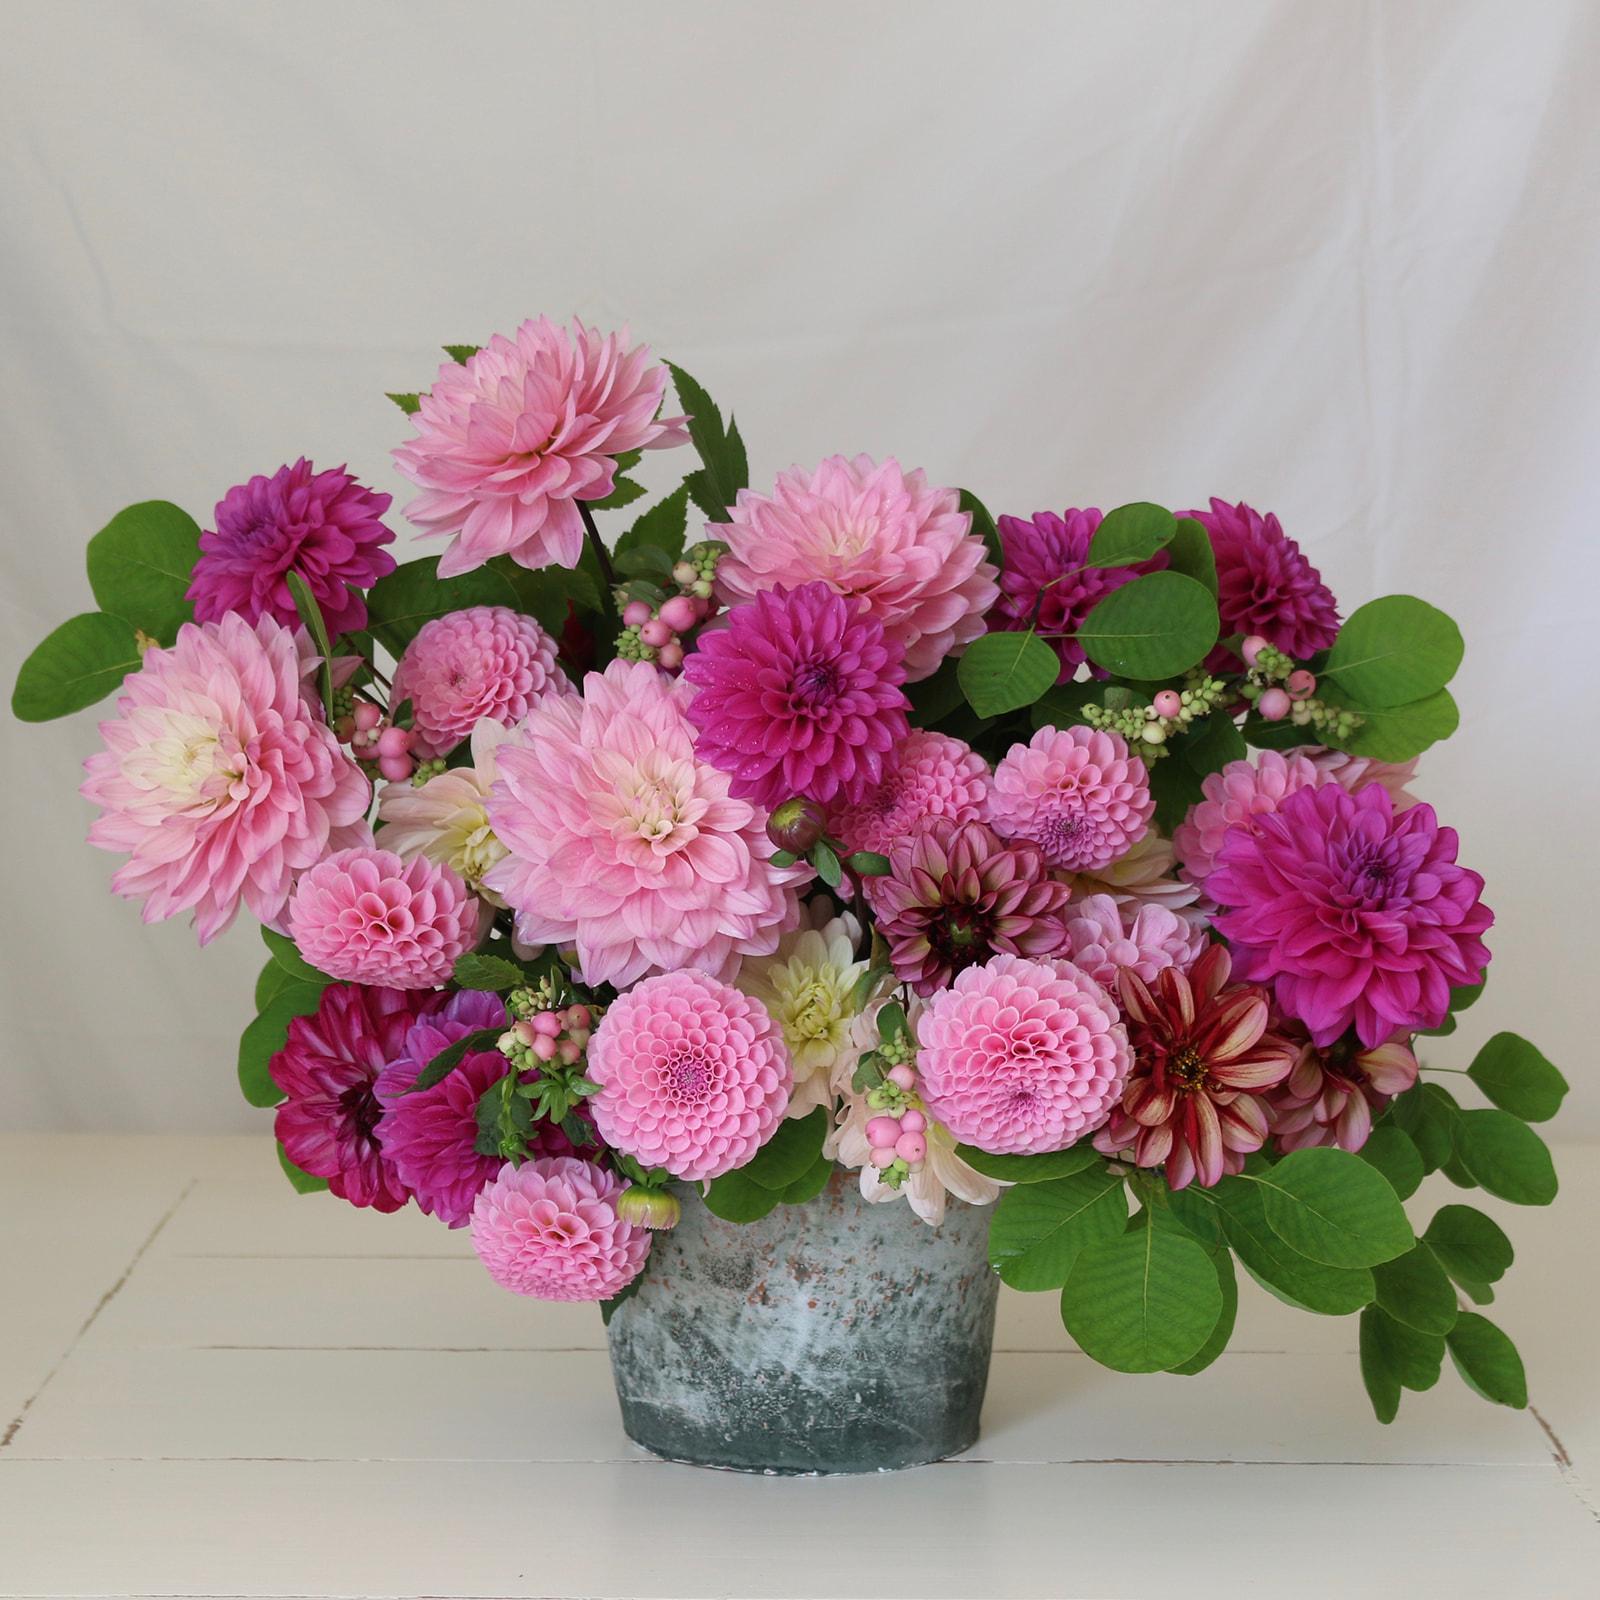 New Dahlia Collections from Flirty Fleurs - Longfield Gardens